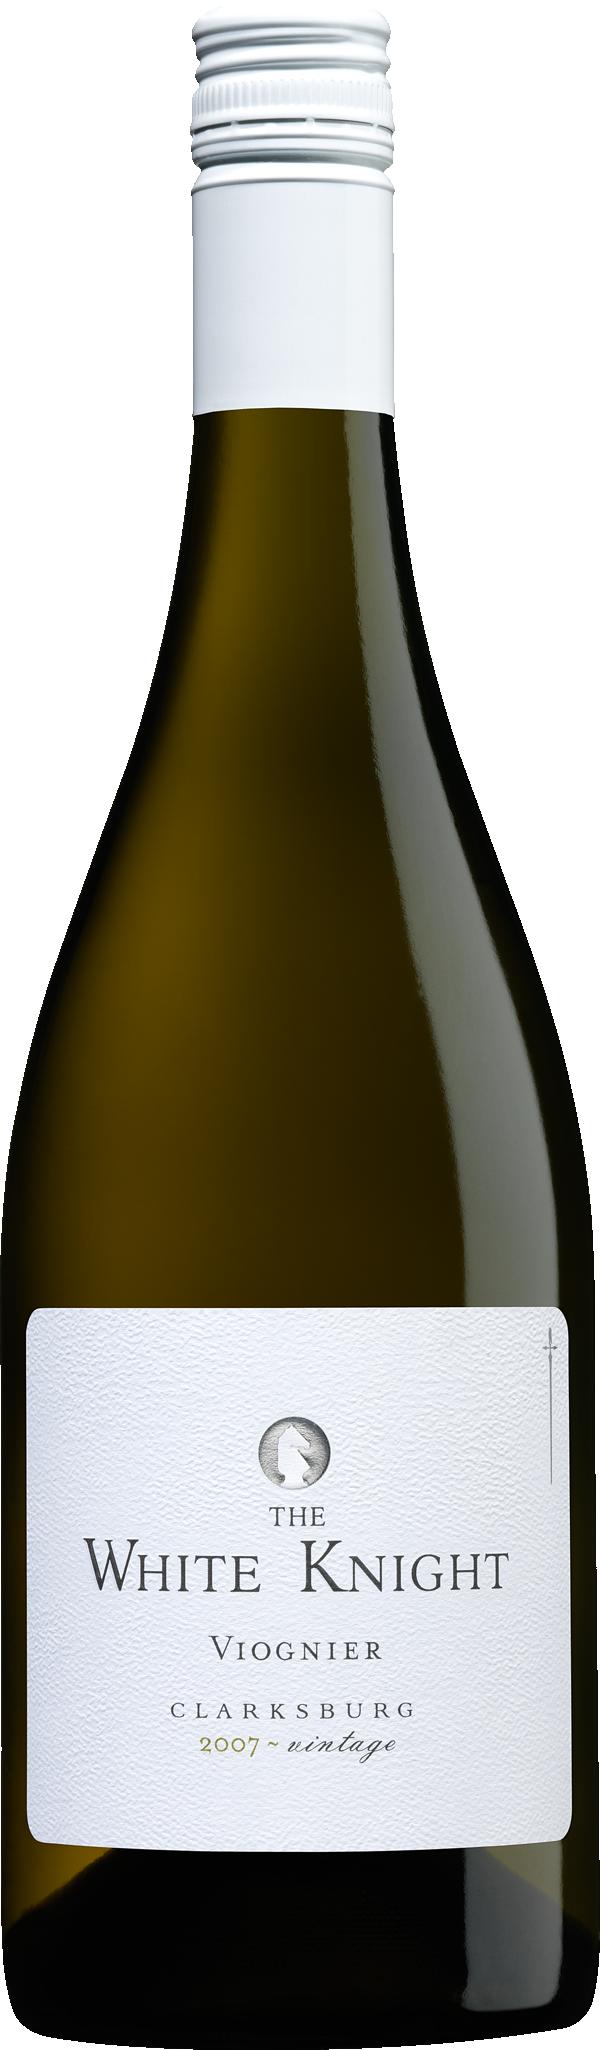 Wine bottle twenty five. Drink clipart spirit alcohol